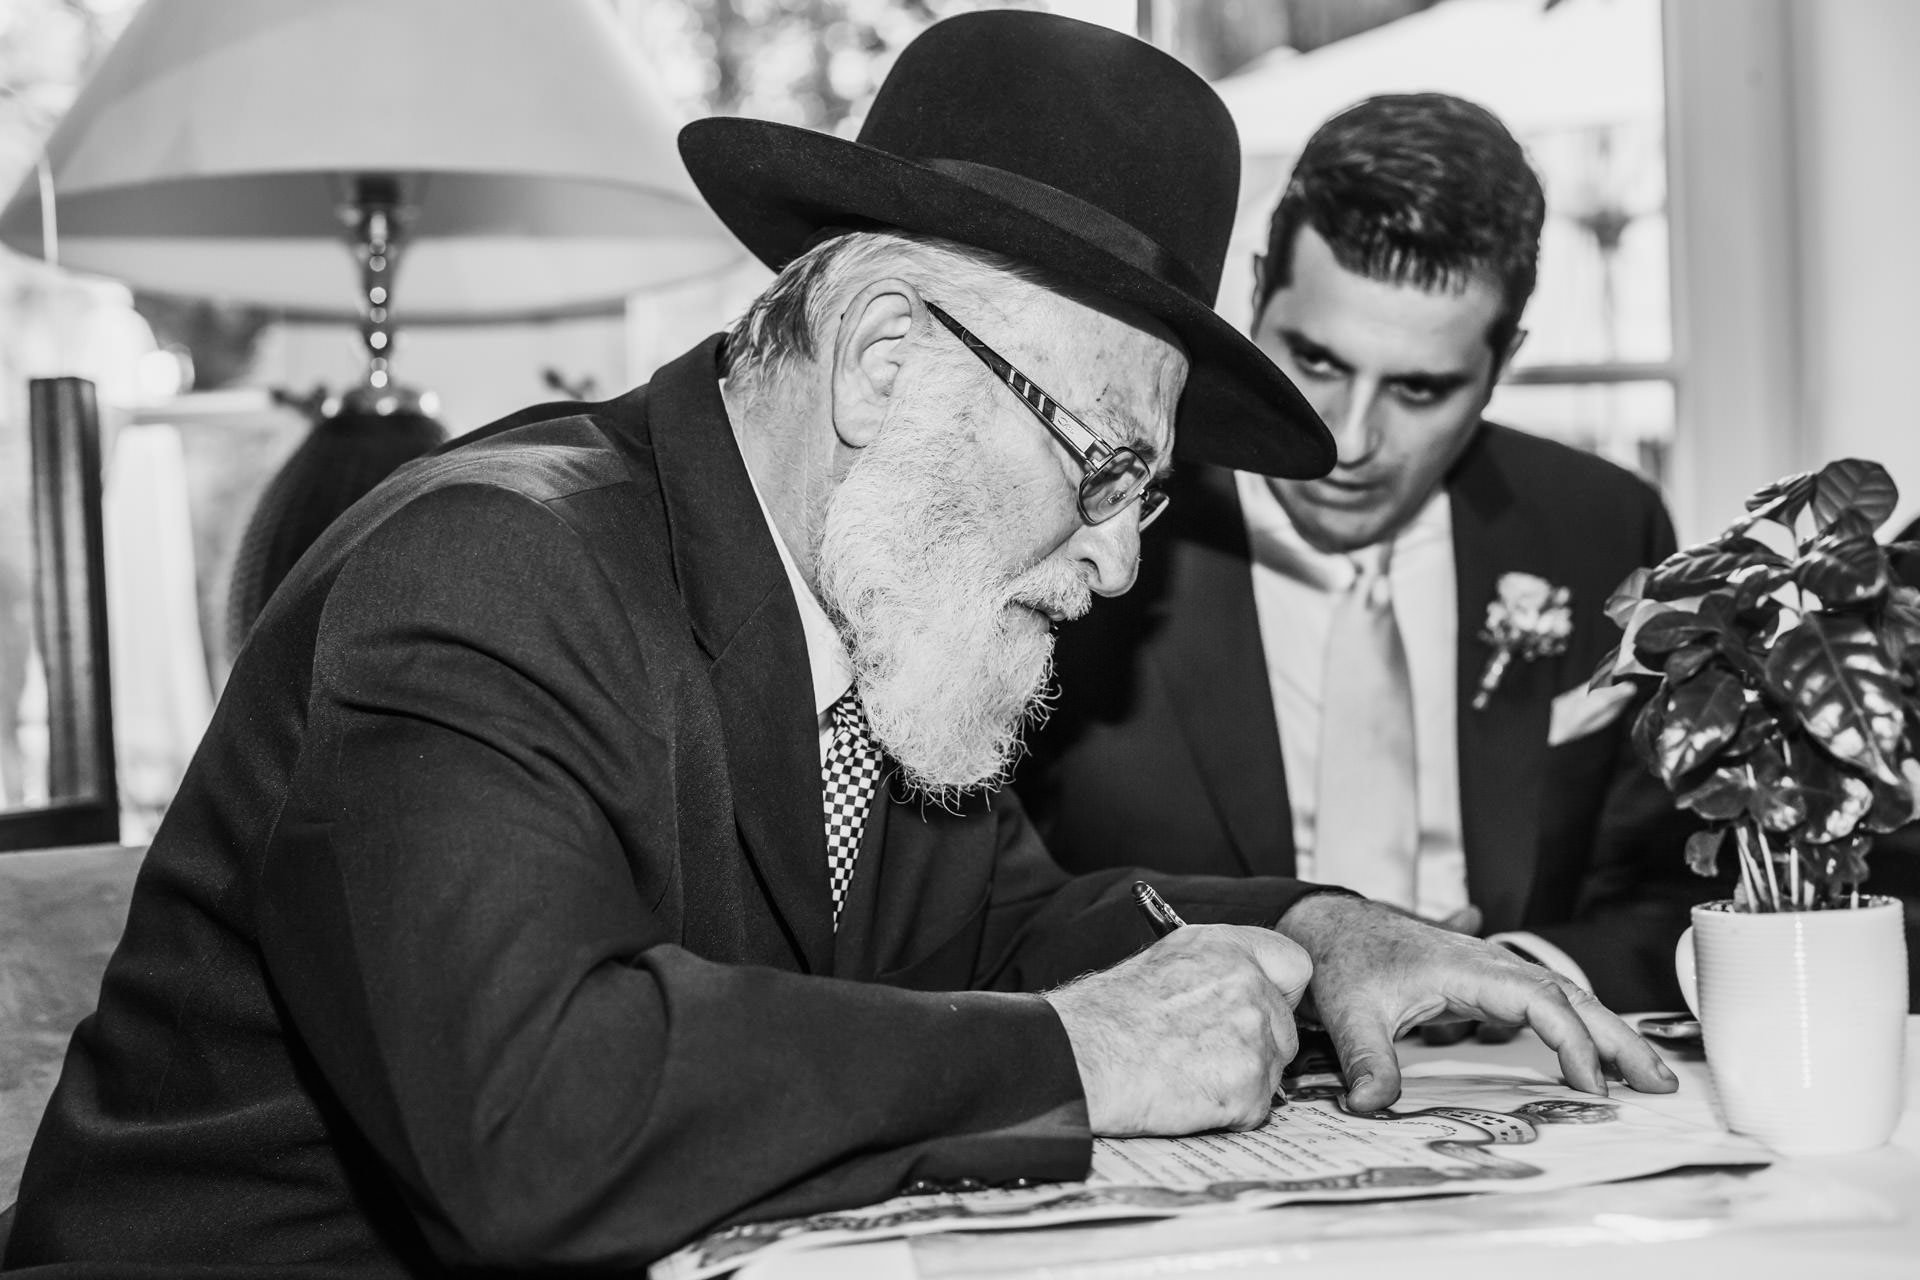 Rabbiner Frankfurt